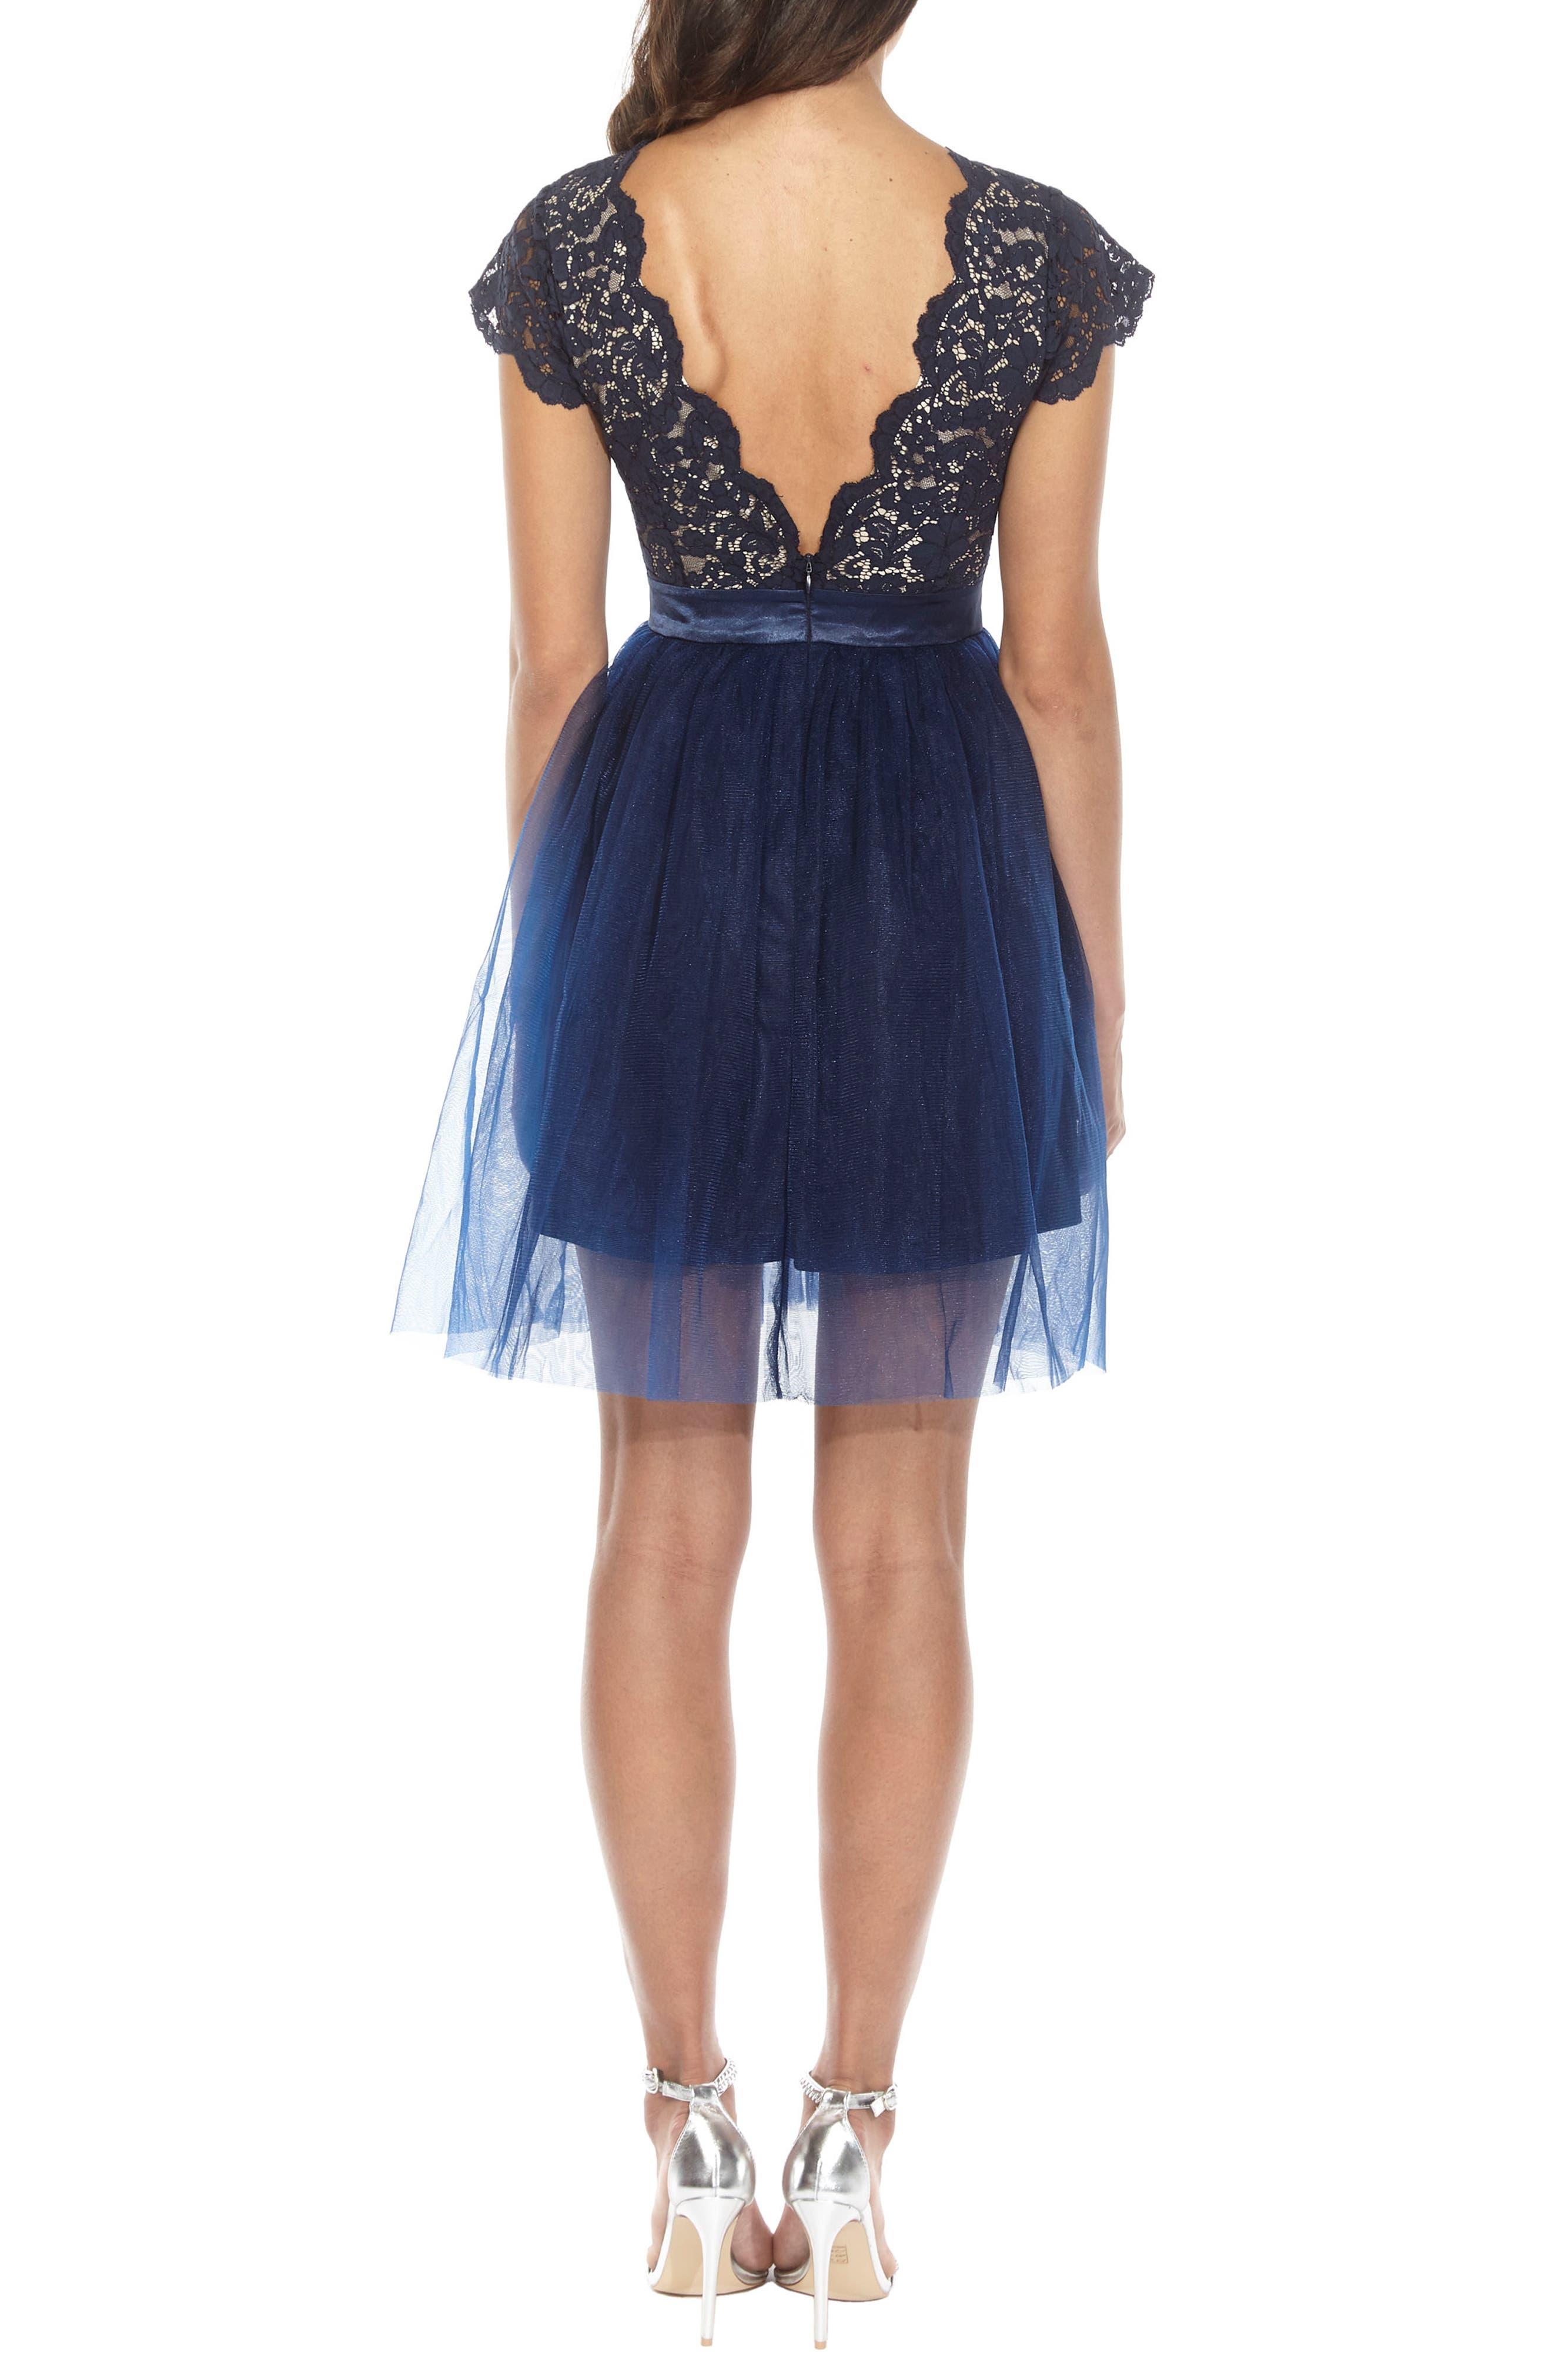 Macen Scalloped Lace Skater Dress,                             Alternate thumbnail 3, color,                             Navy